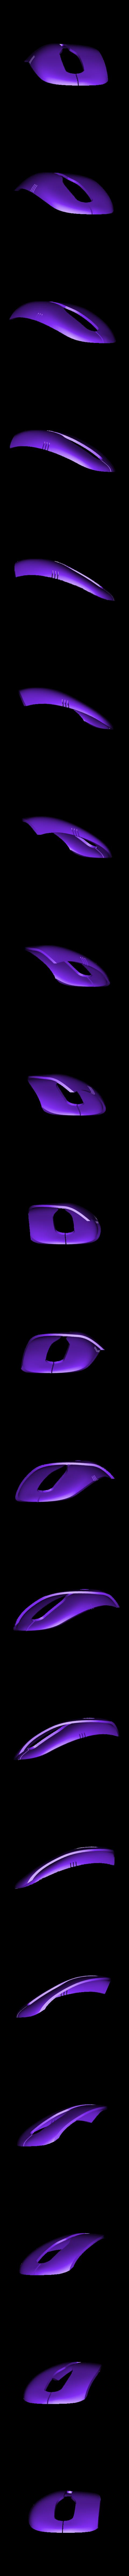 azuro_top1.stl Download free STL file Azuro Computer Mouse • 3D printer model, MaxMKA